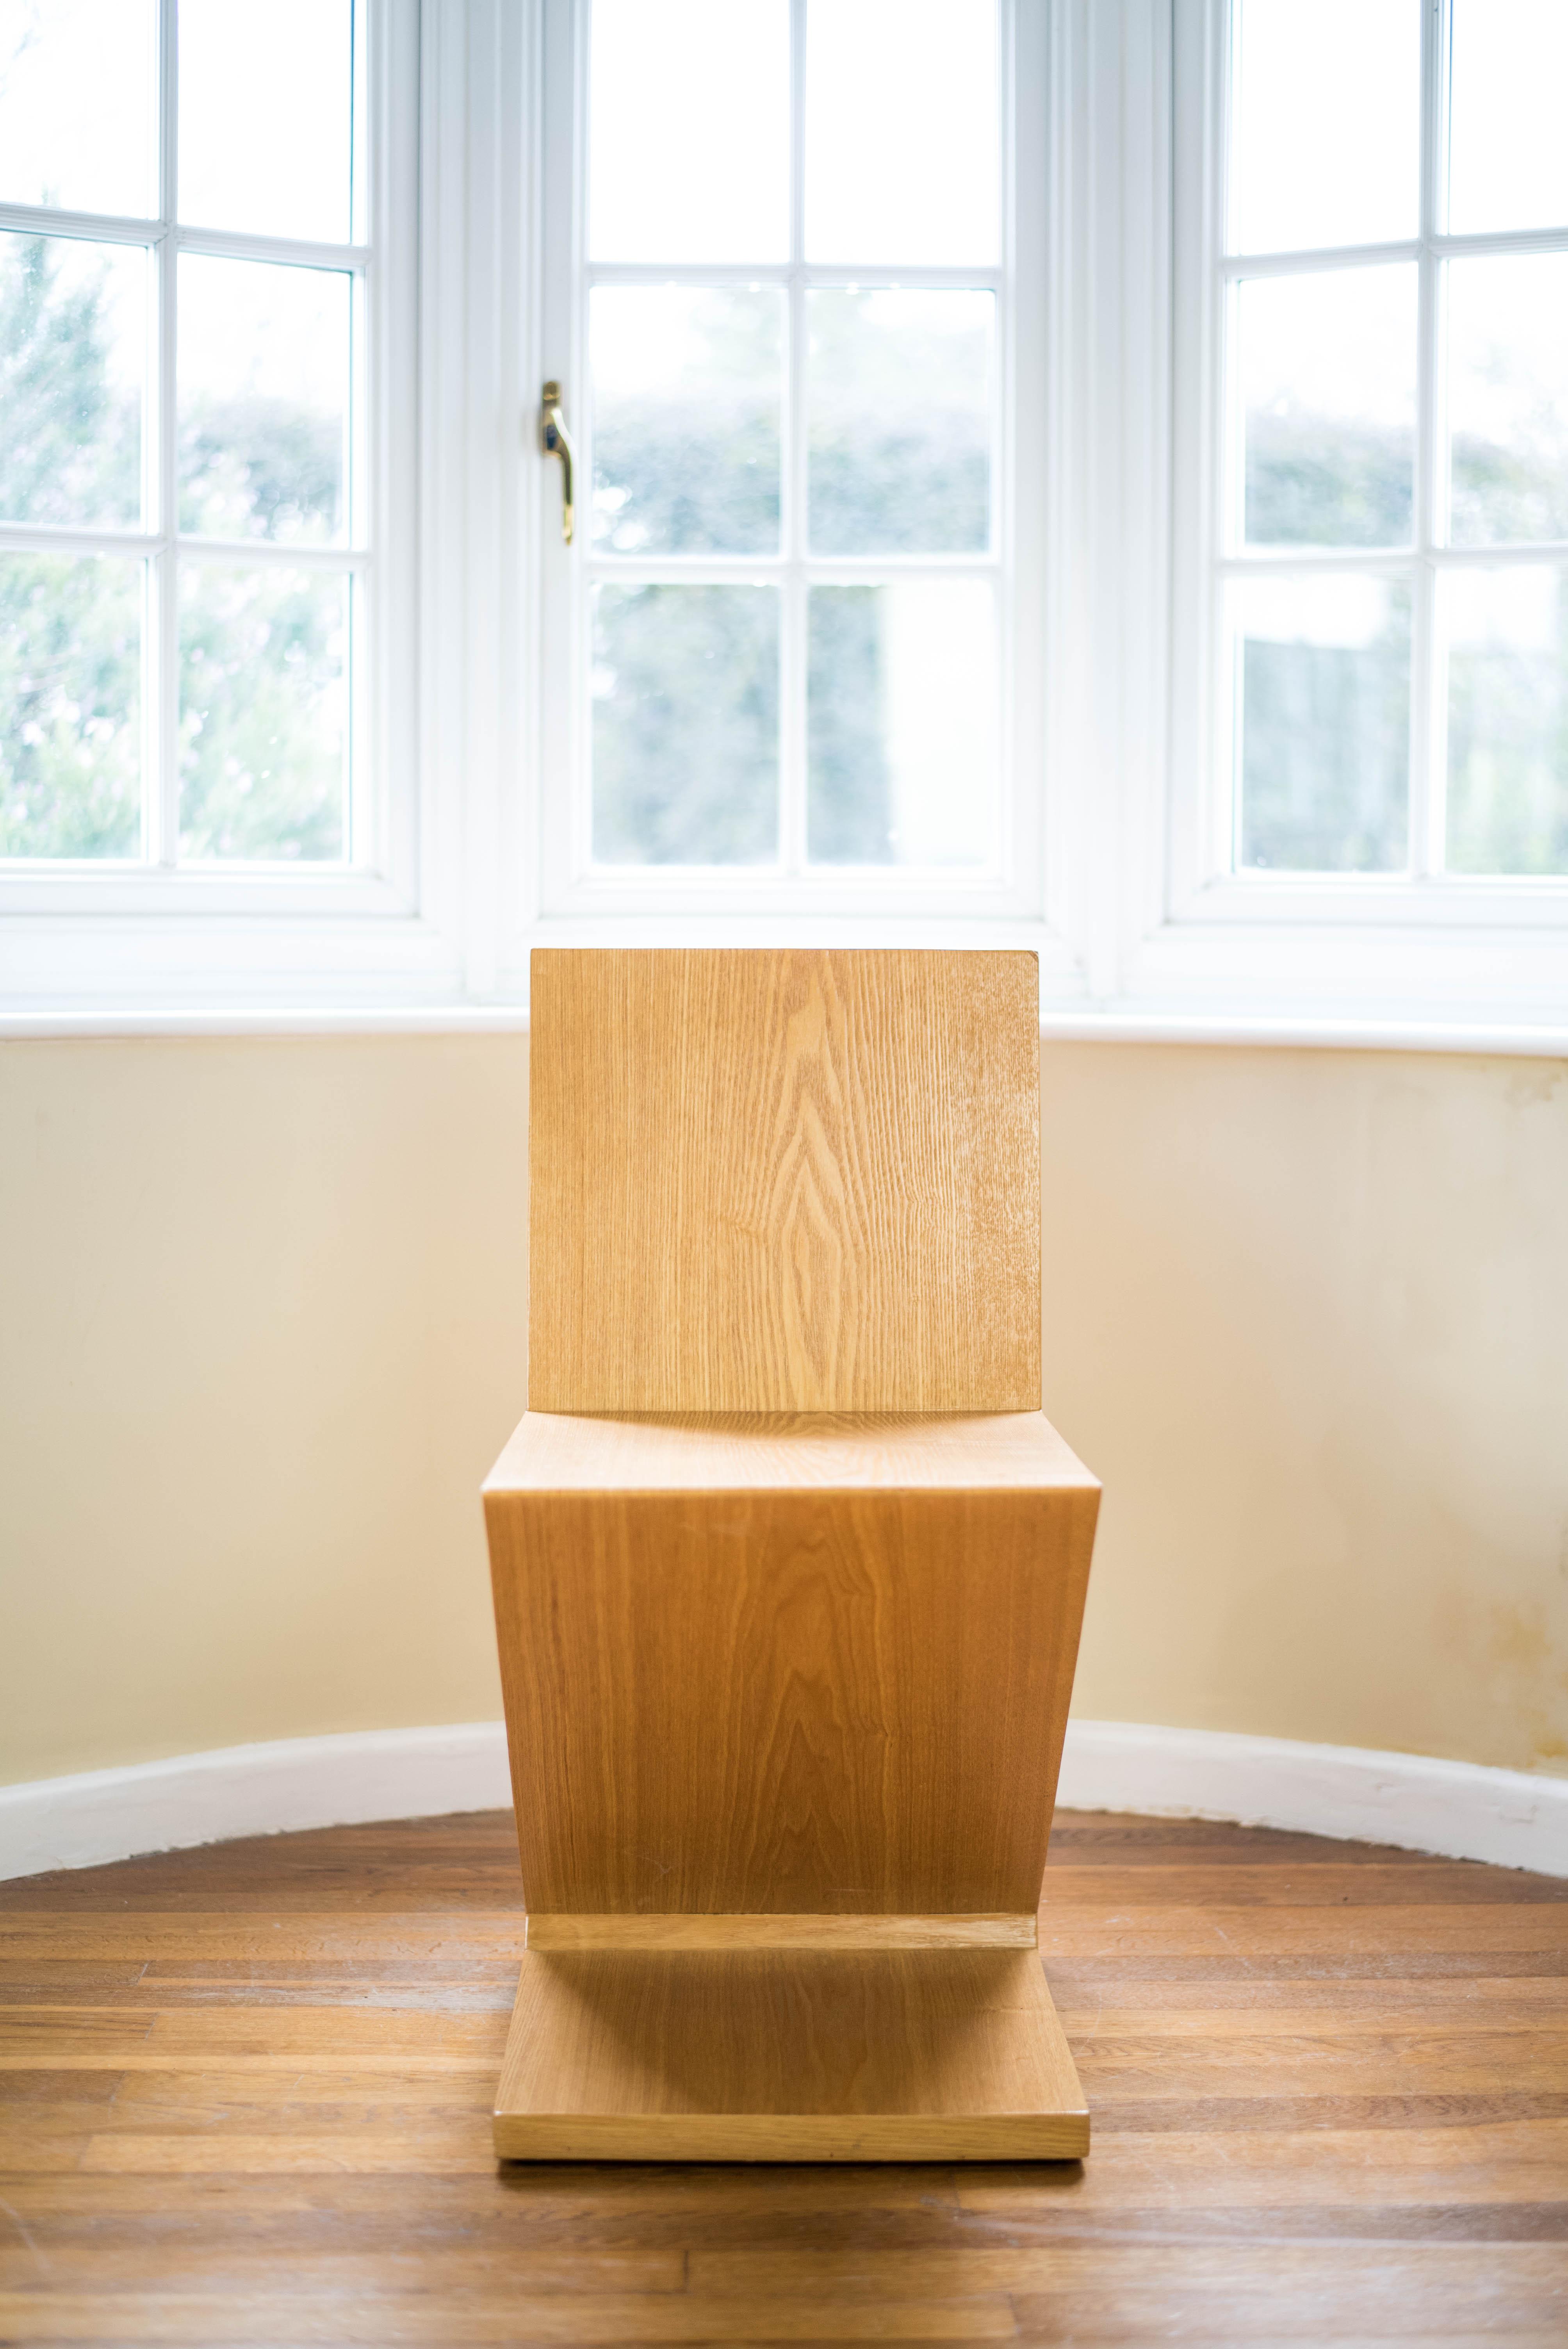 Zig Zag Chair Gerrit Thomas Rietveld front